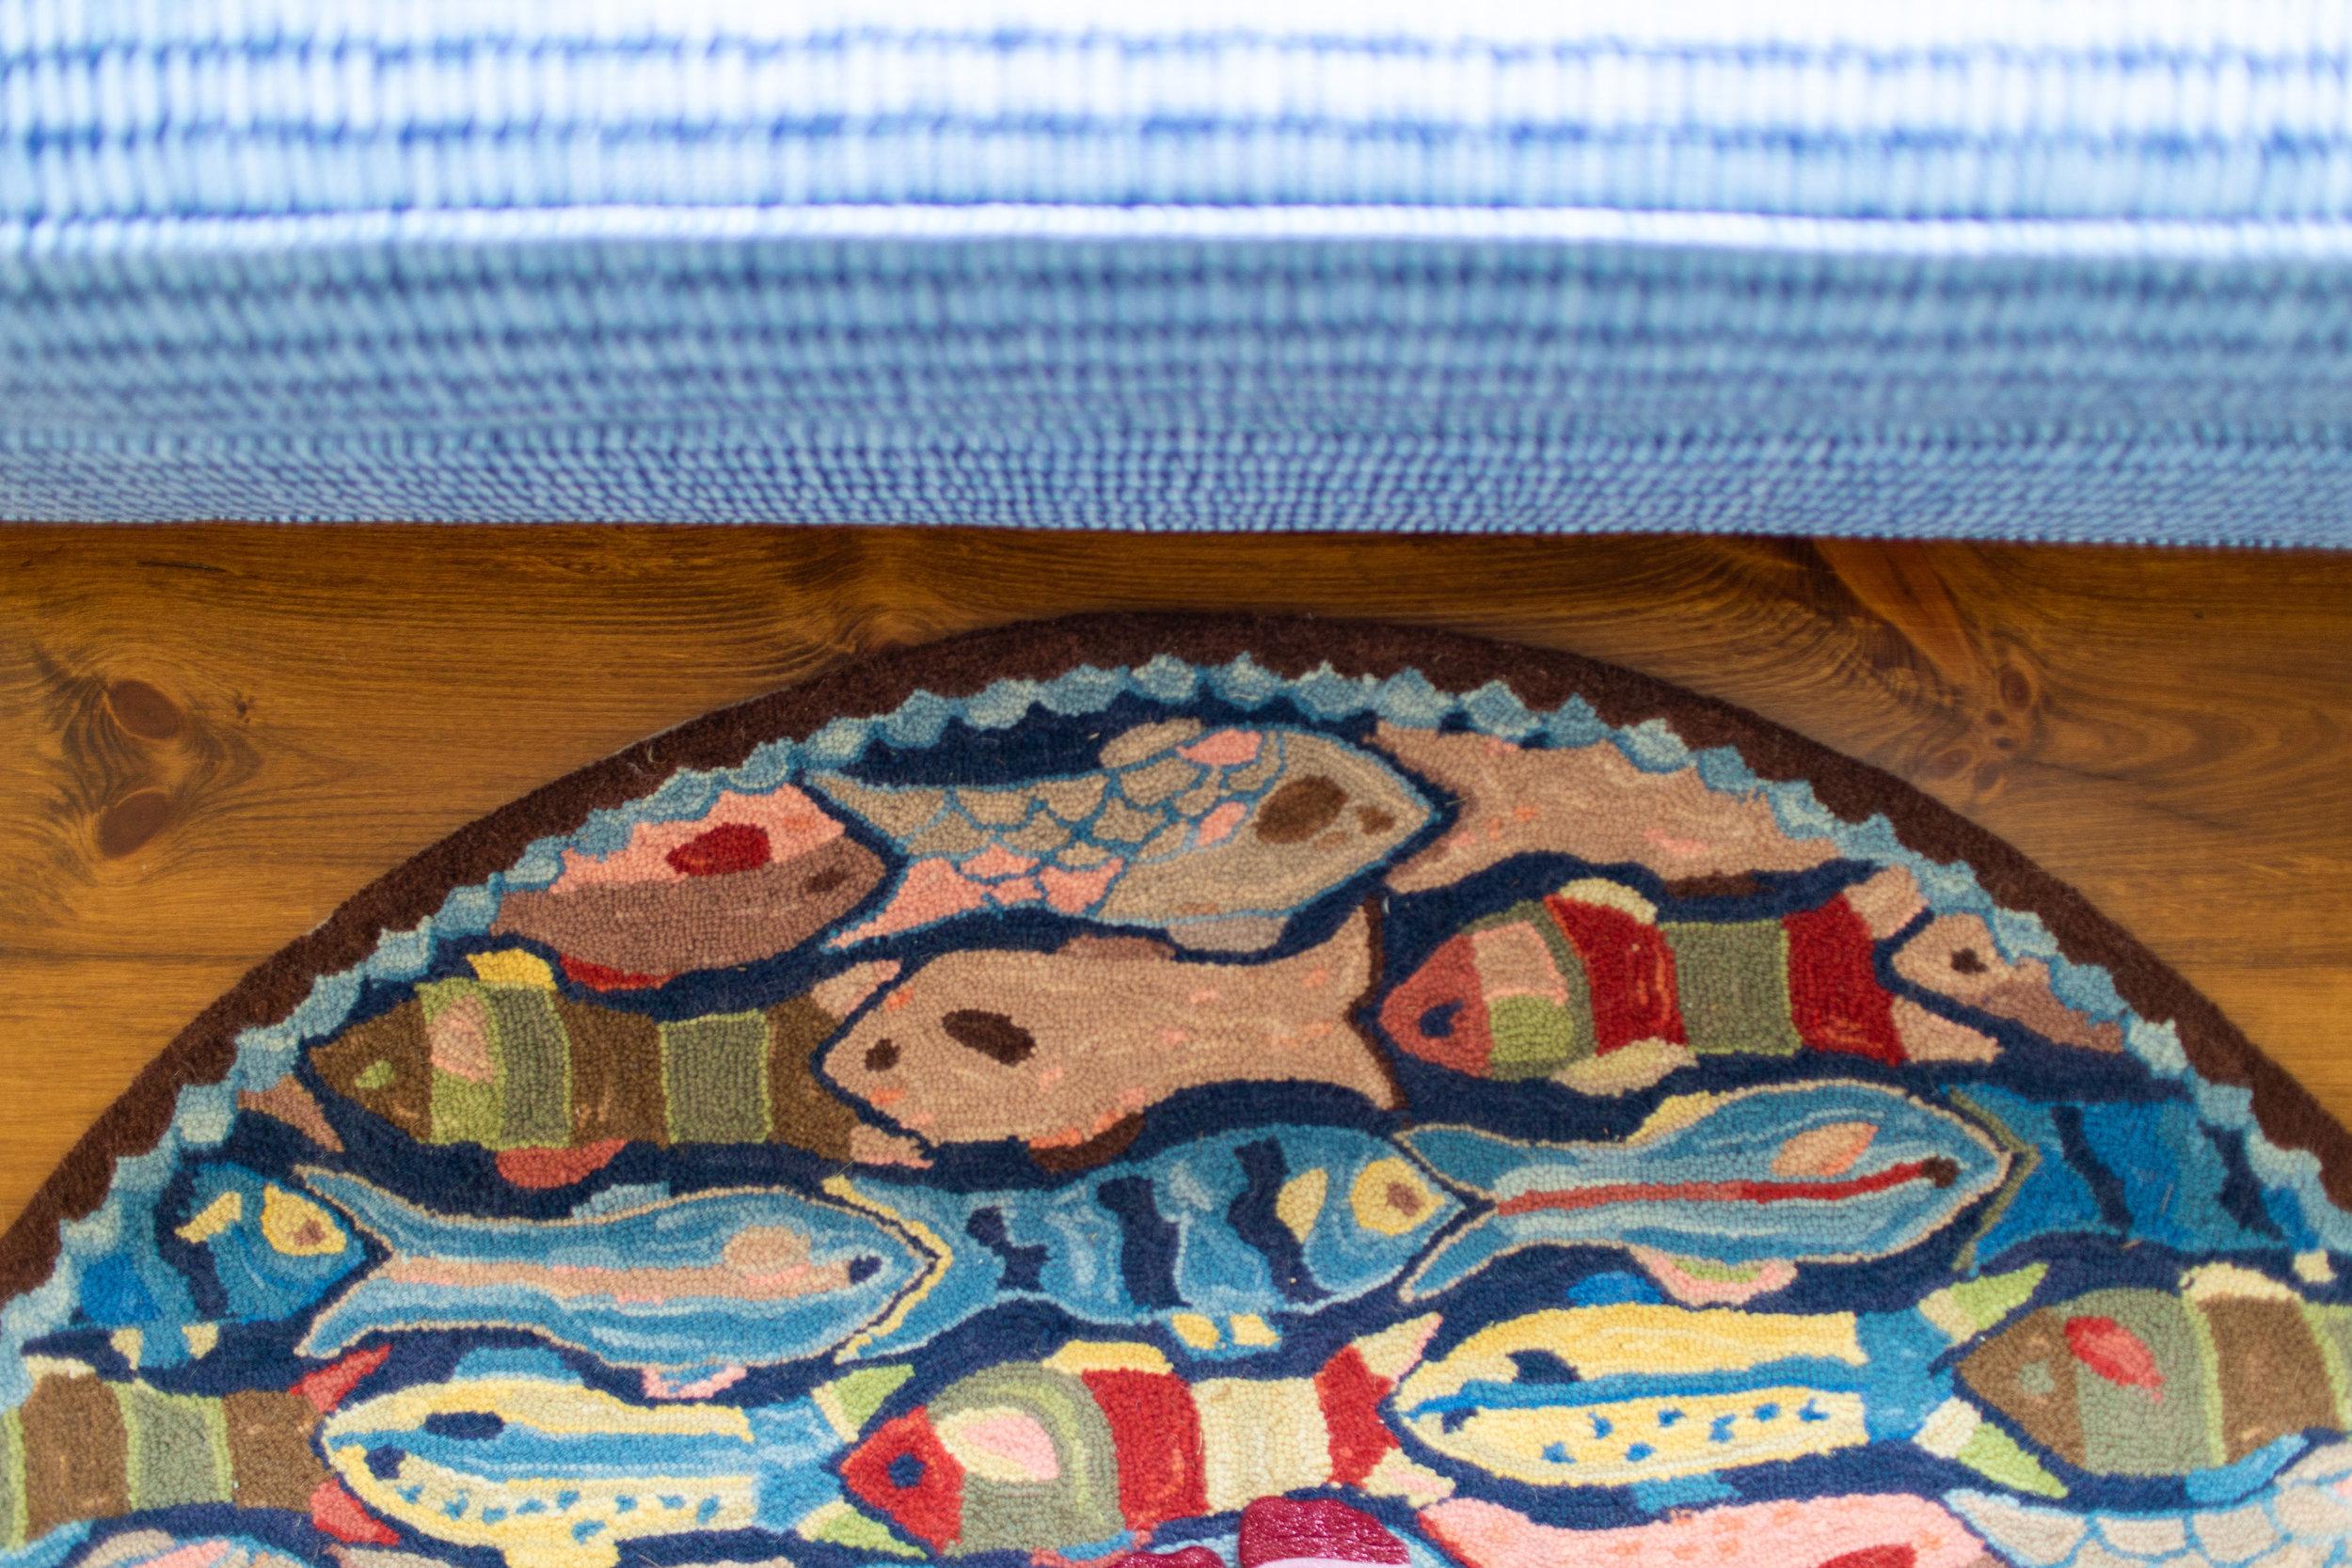 Lake house area rug, Teaselwood Design